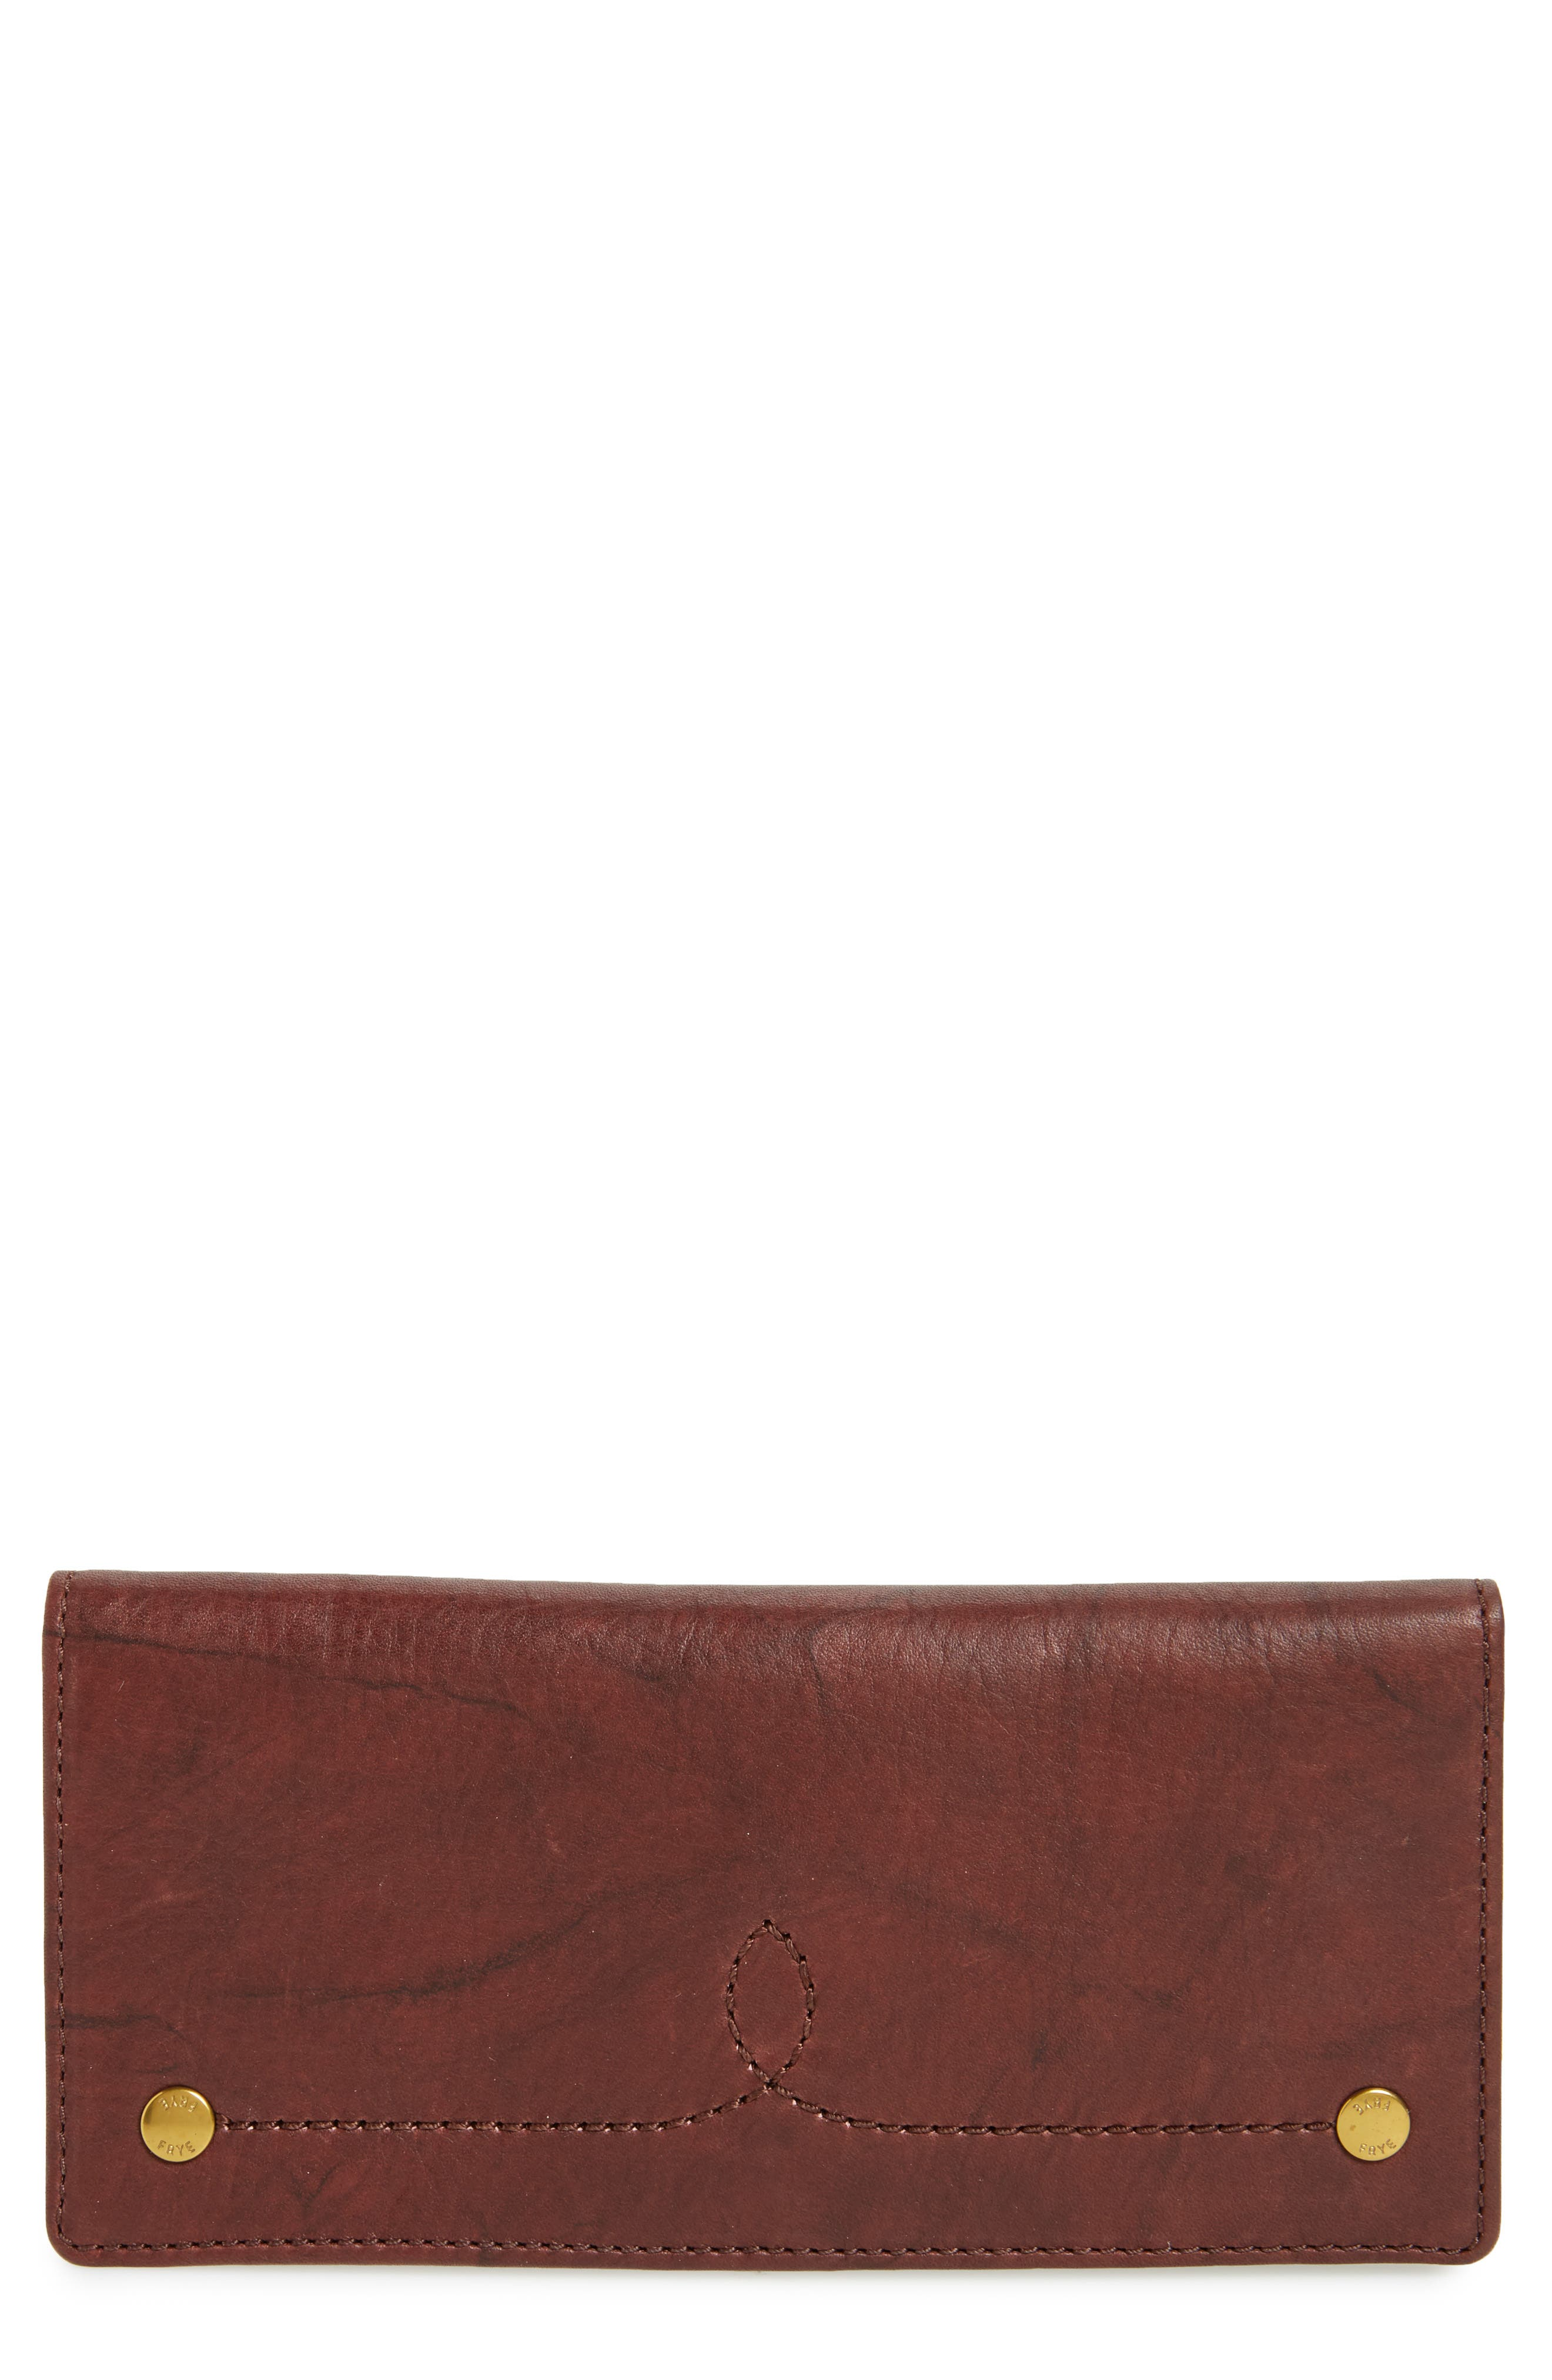 Main Image - Frye Campus Rivet Slim Leather Wallet